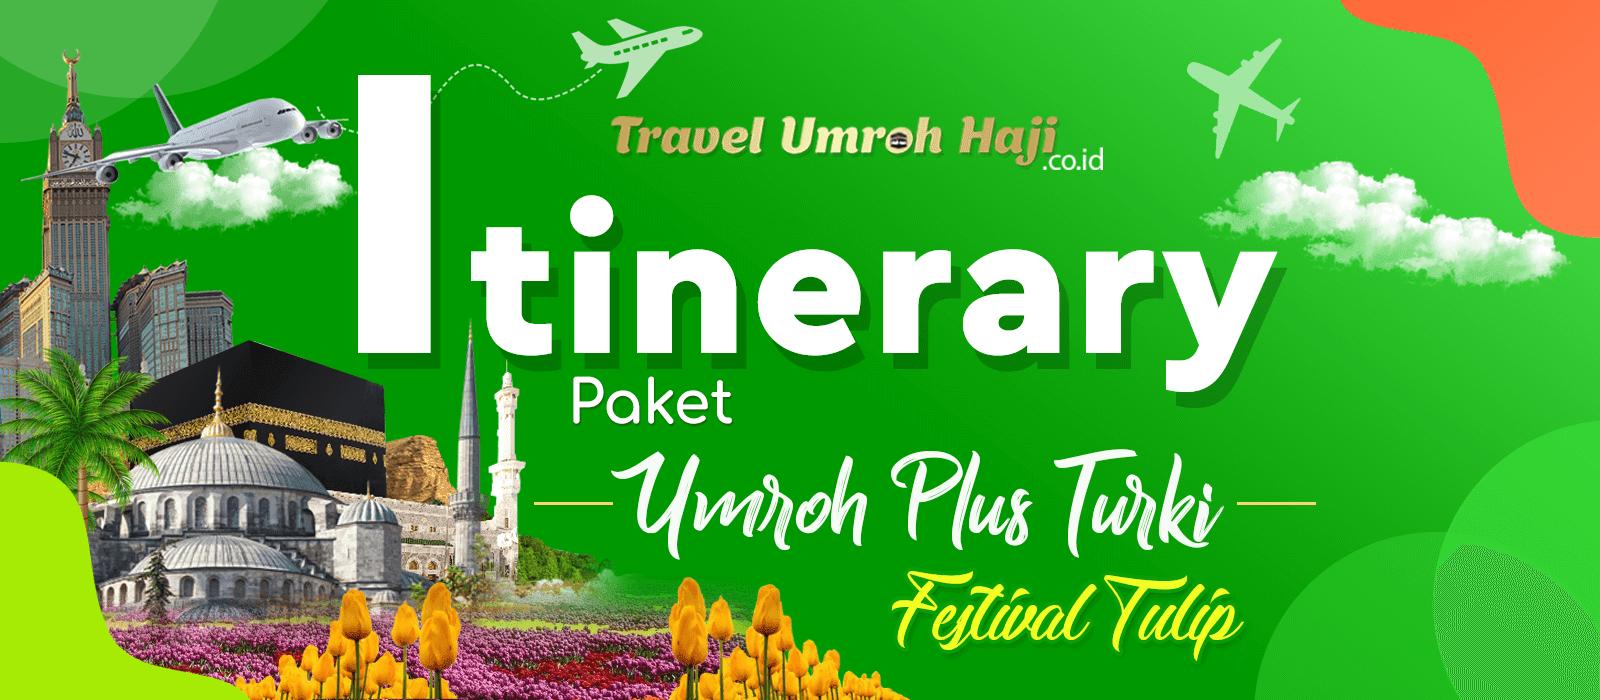 Program Itinerary Umroh Plus Turki 12 Hari Musim Semi Festival Tulip